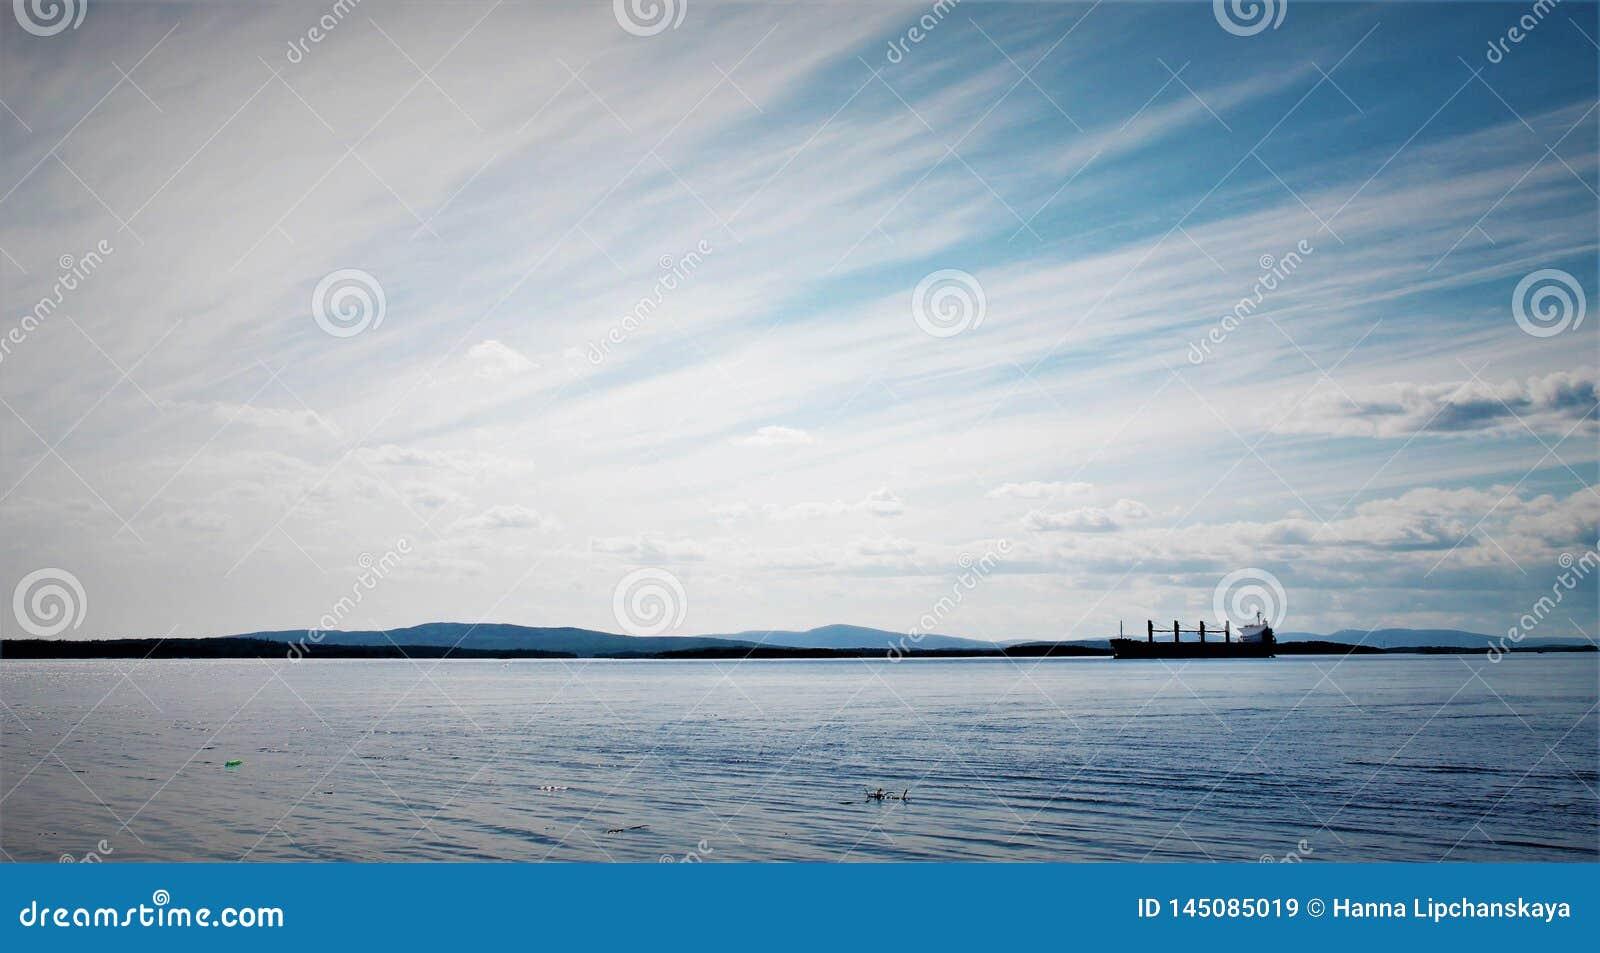 A ship sailing in the White sea